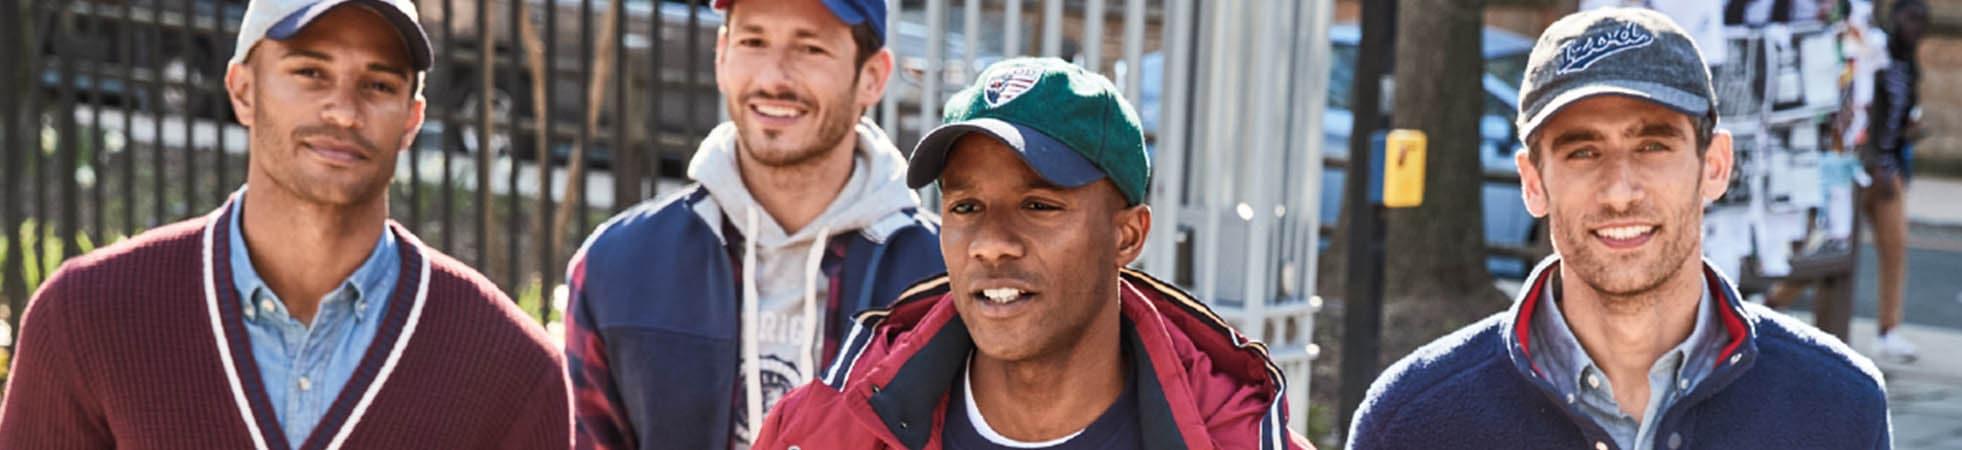 Men\'s caps & hats at Suitable ✔ Different colours and fits ✔ Brands like Levi\'s, Superdry, Tommy Hilfiger, Barbour, Napapijri and more ✔ Shop onlines